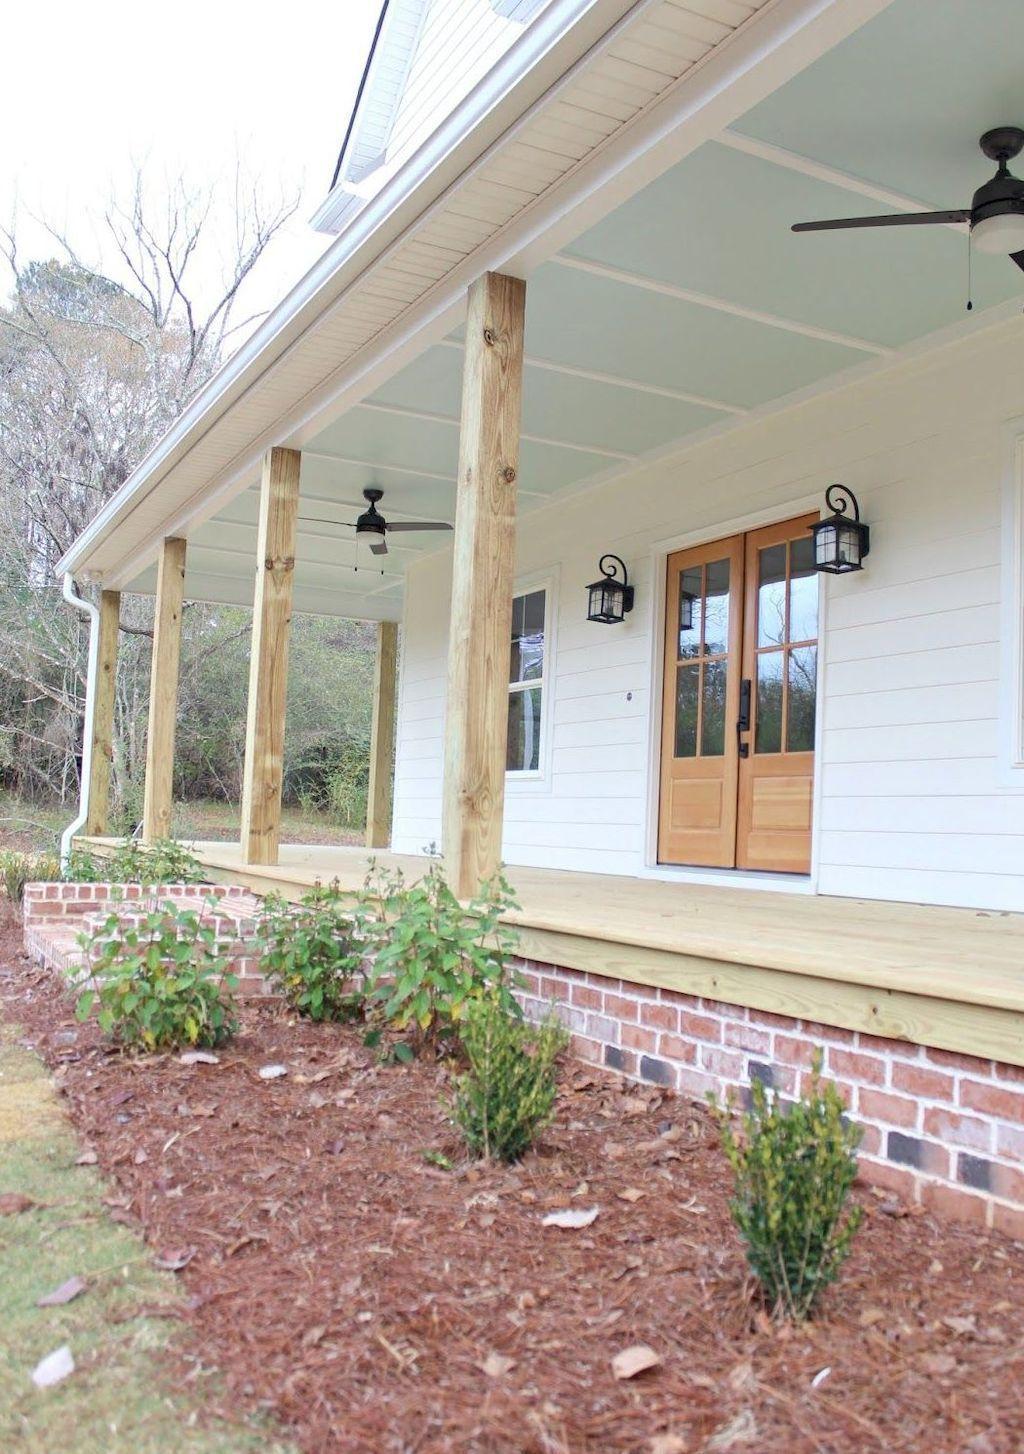 34 stunning farmhouse front porch decor ideas